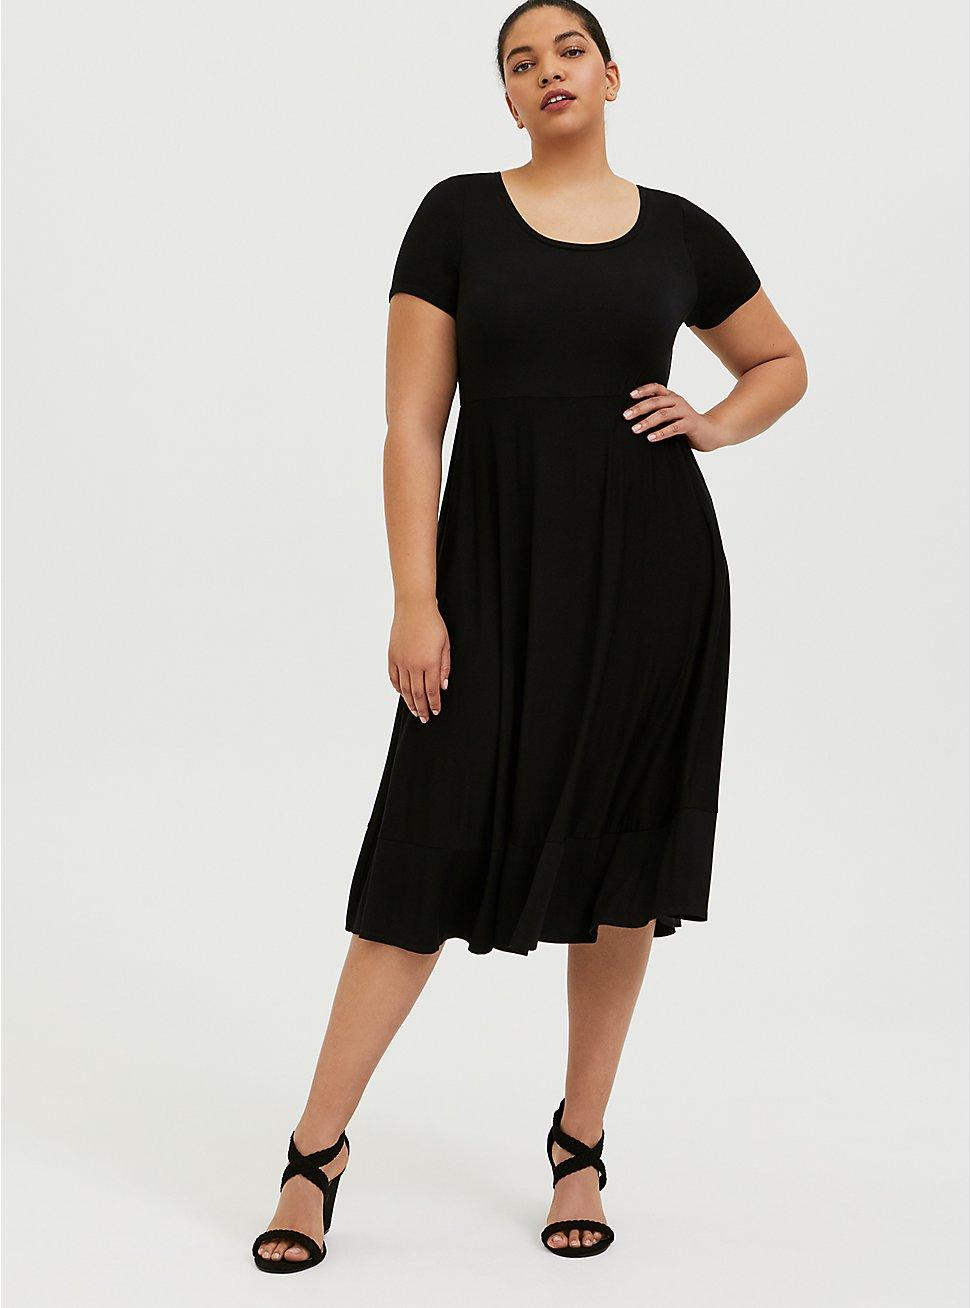 Plus Size Super Soft Black Midi Dress, DEEP BLACK, hi-res